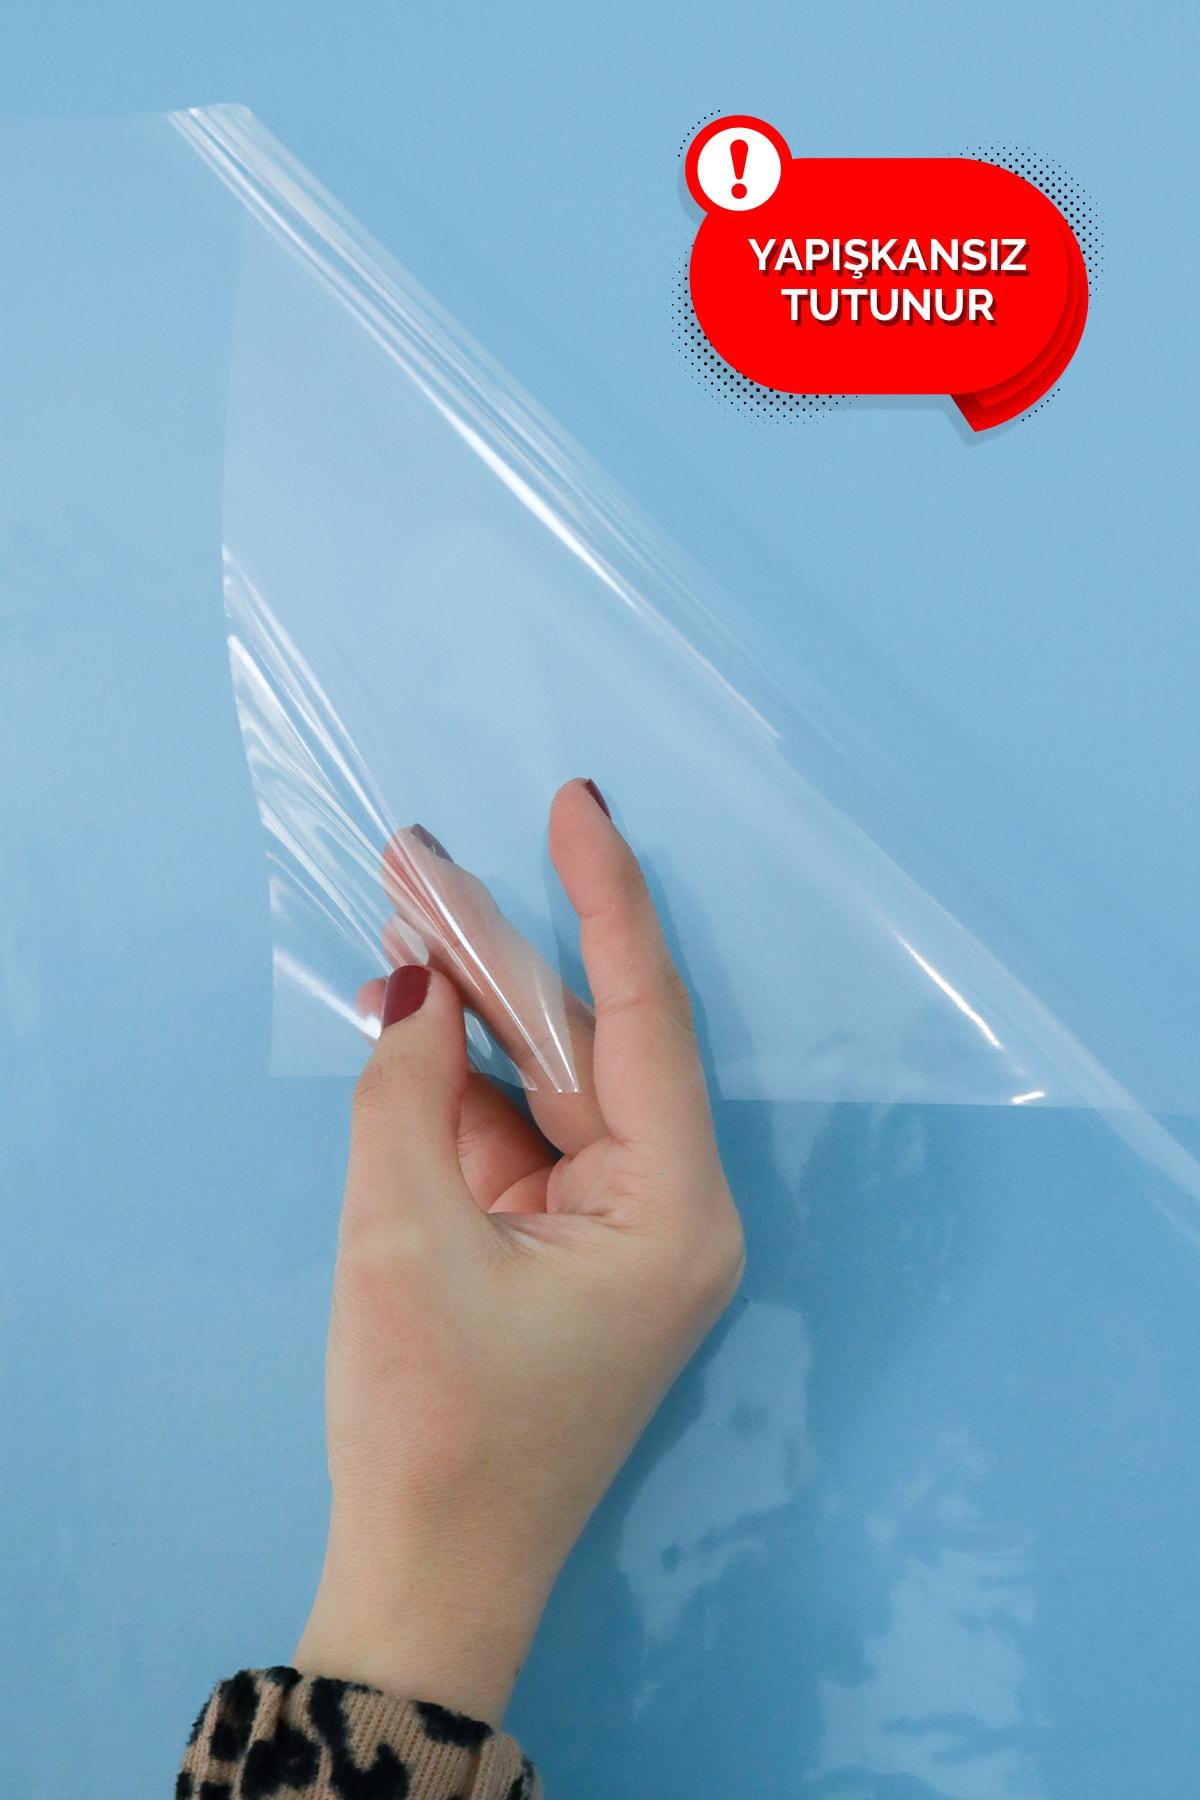 Evbuya Şeffaf Akıllı Kağıt ) 60 X 100 cm 2